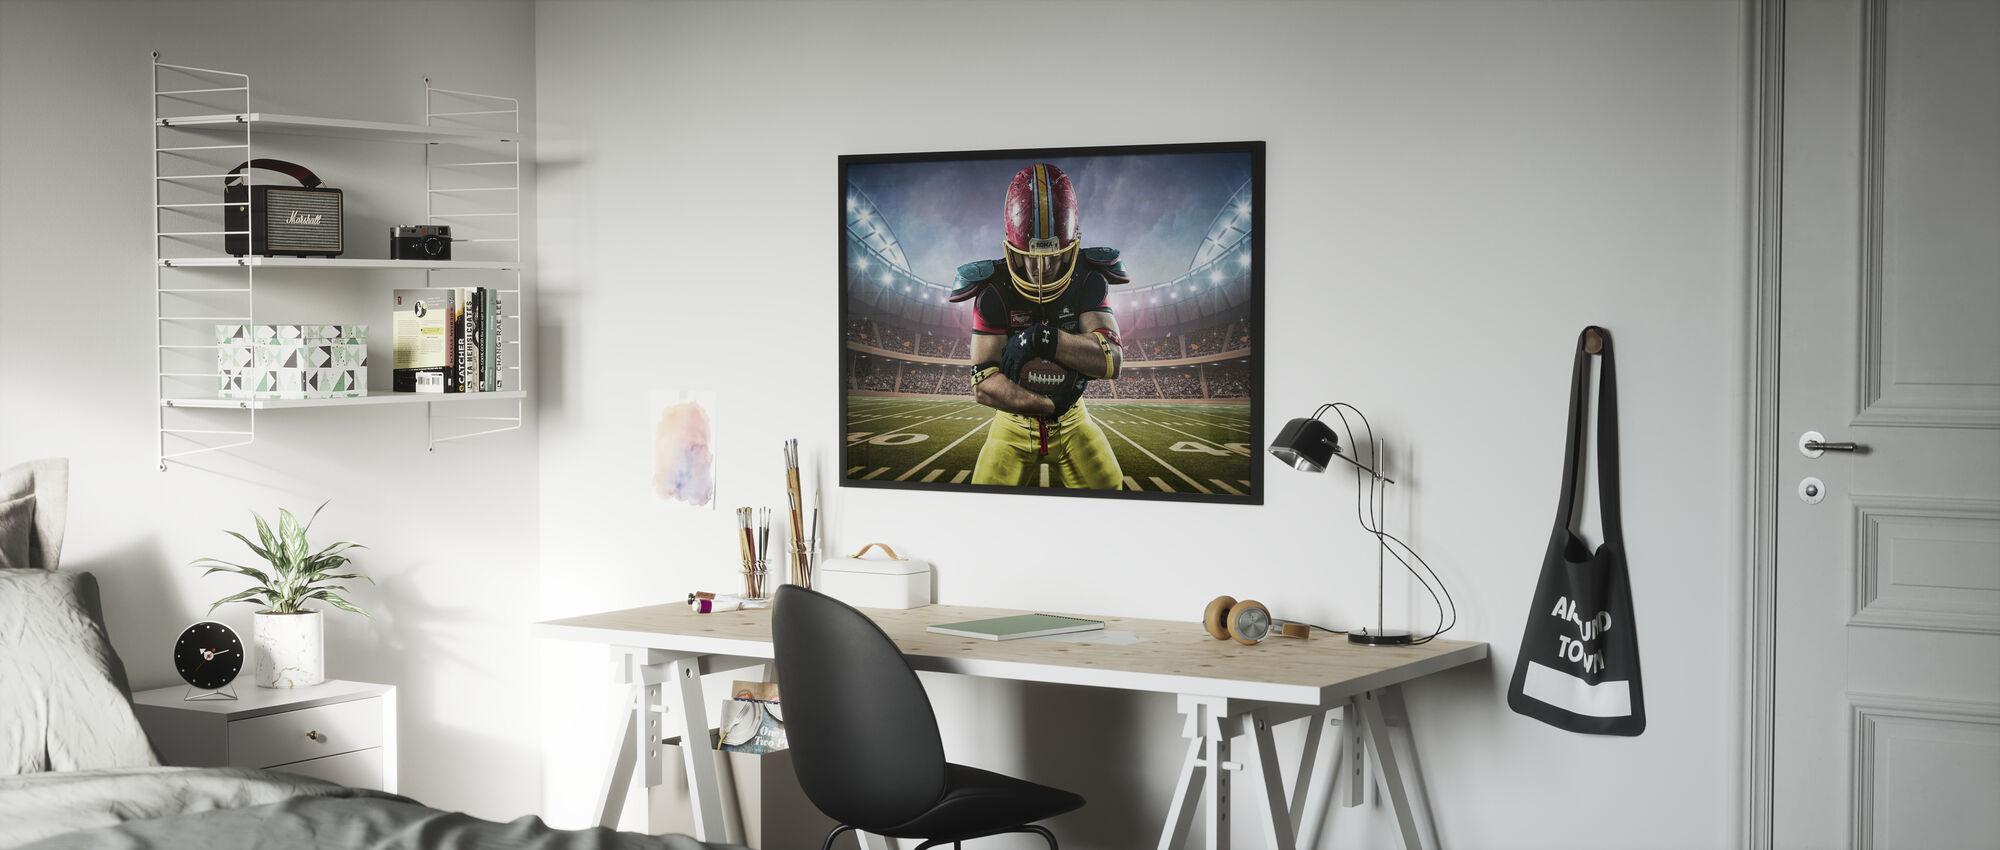 Danilo - Framed print - Kids Room